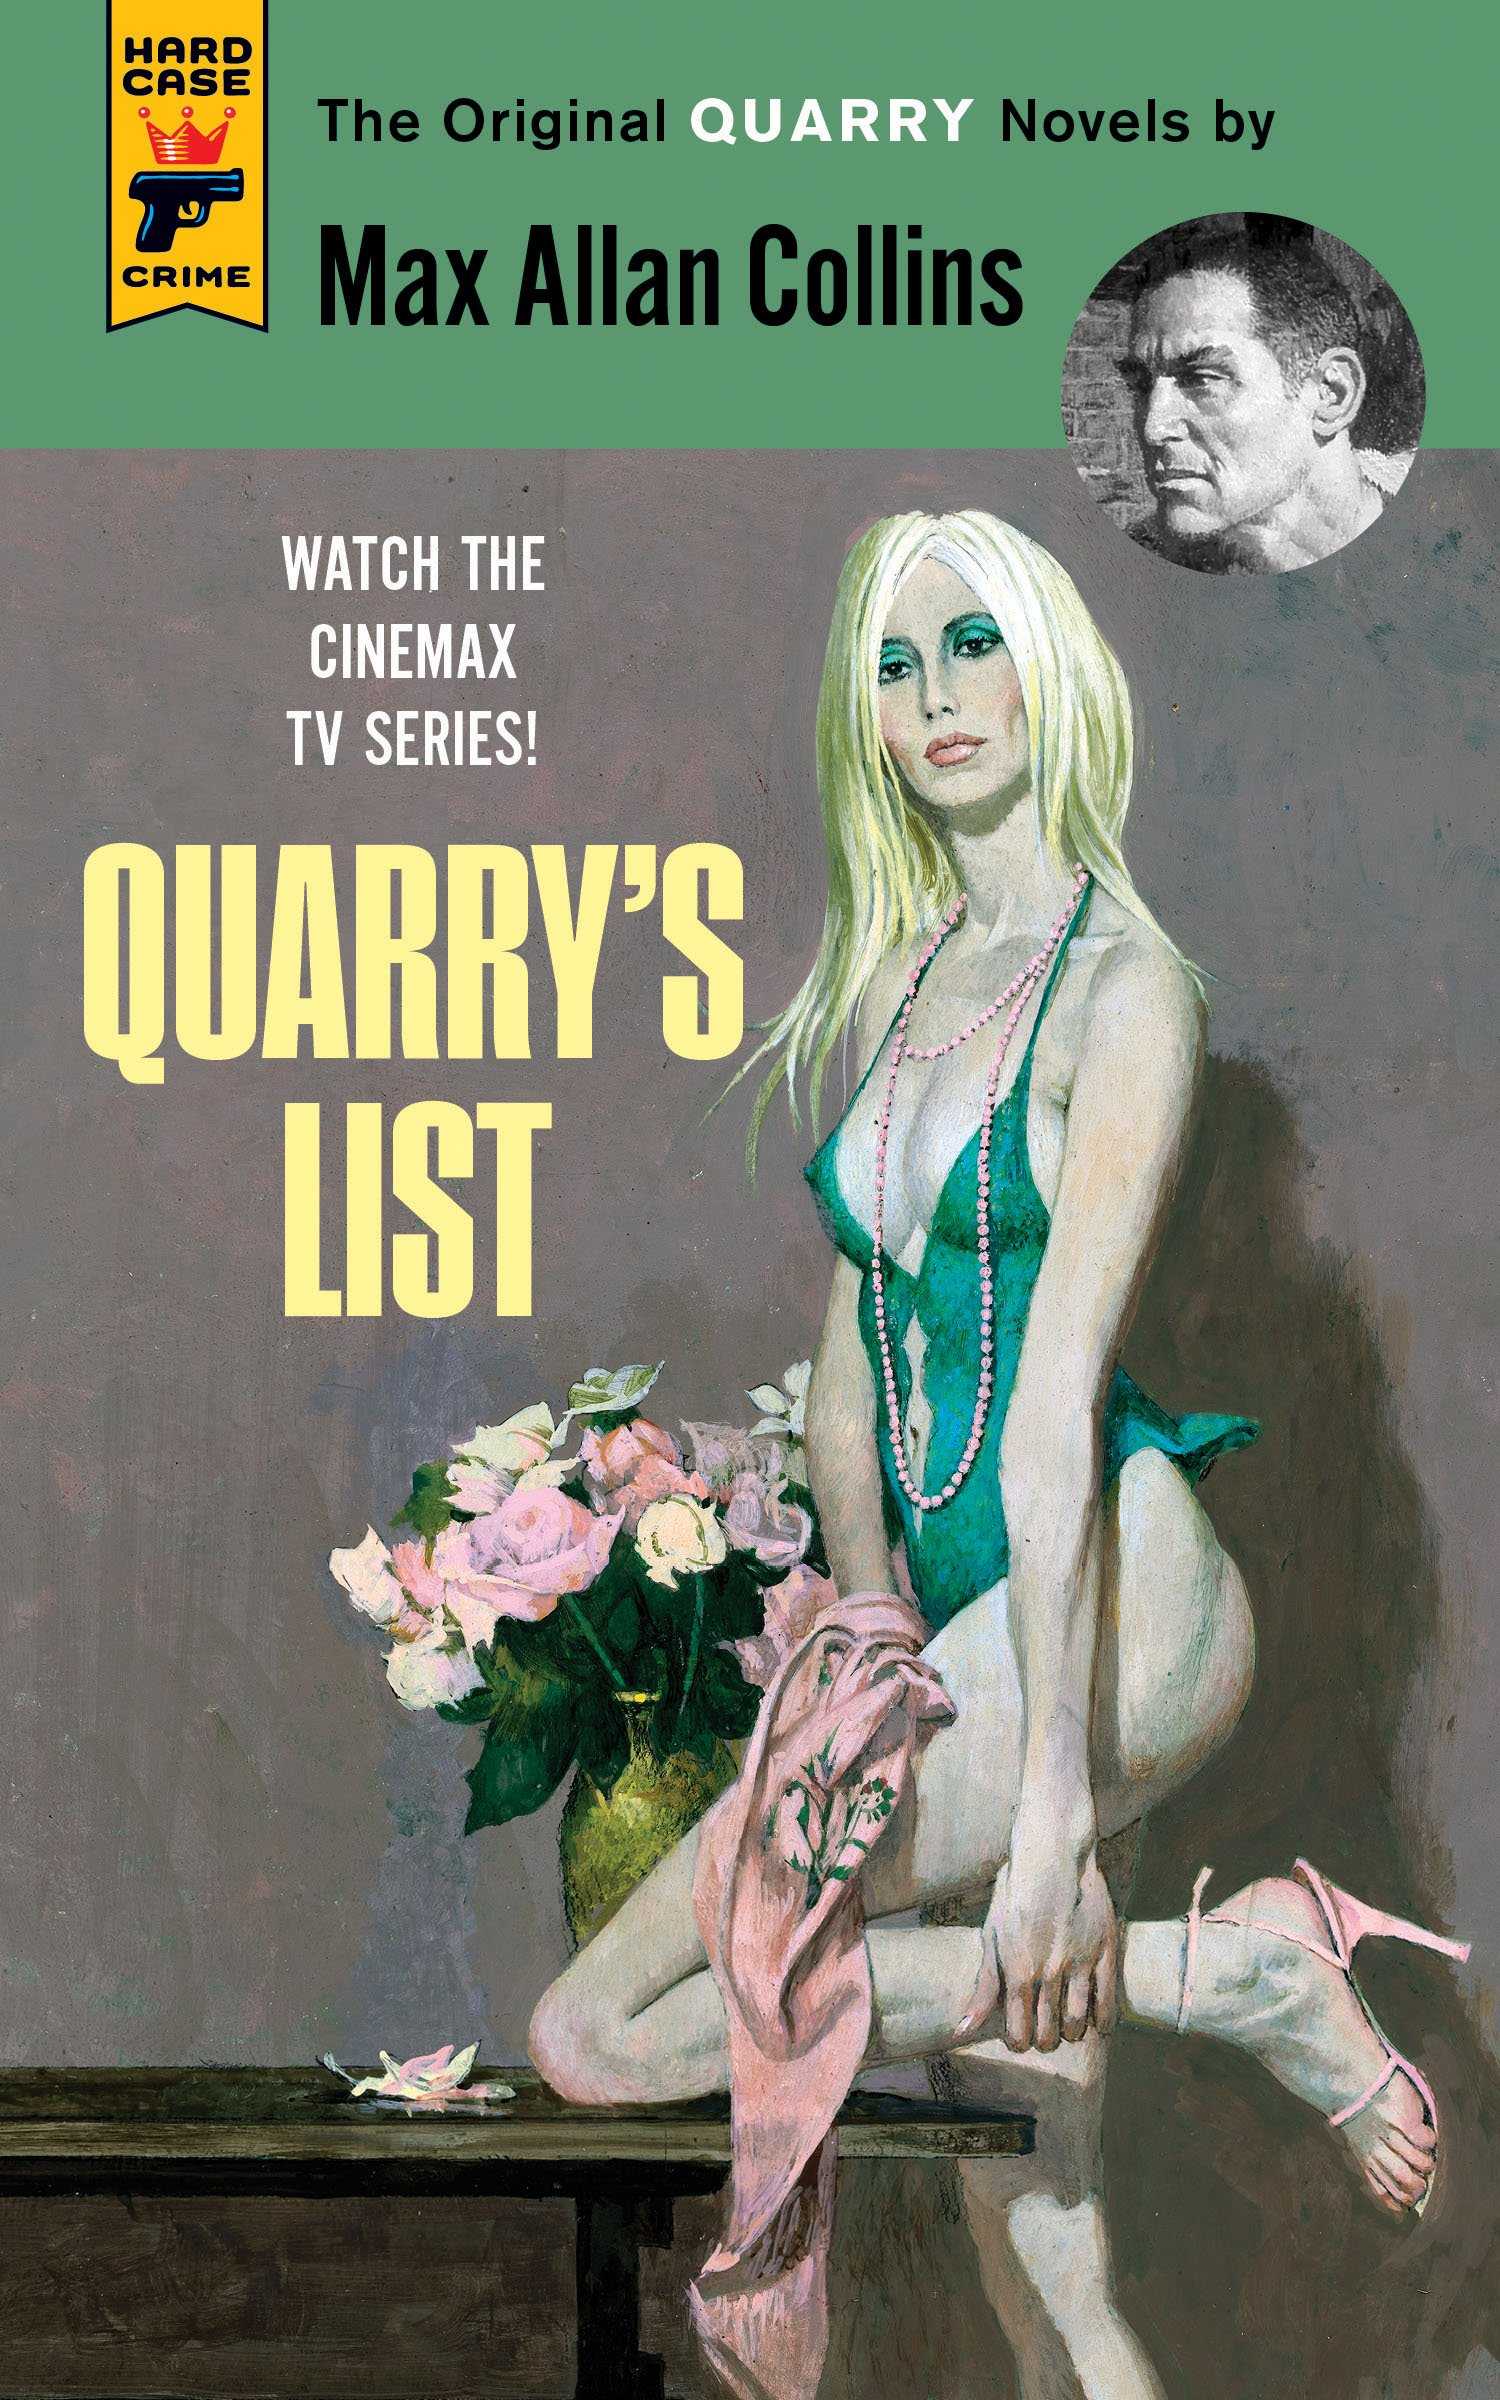 Amazon.com: Quarry's List (9781783298853): Collins, Max Allan: Books